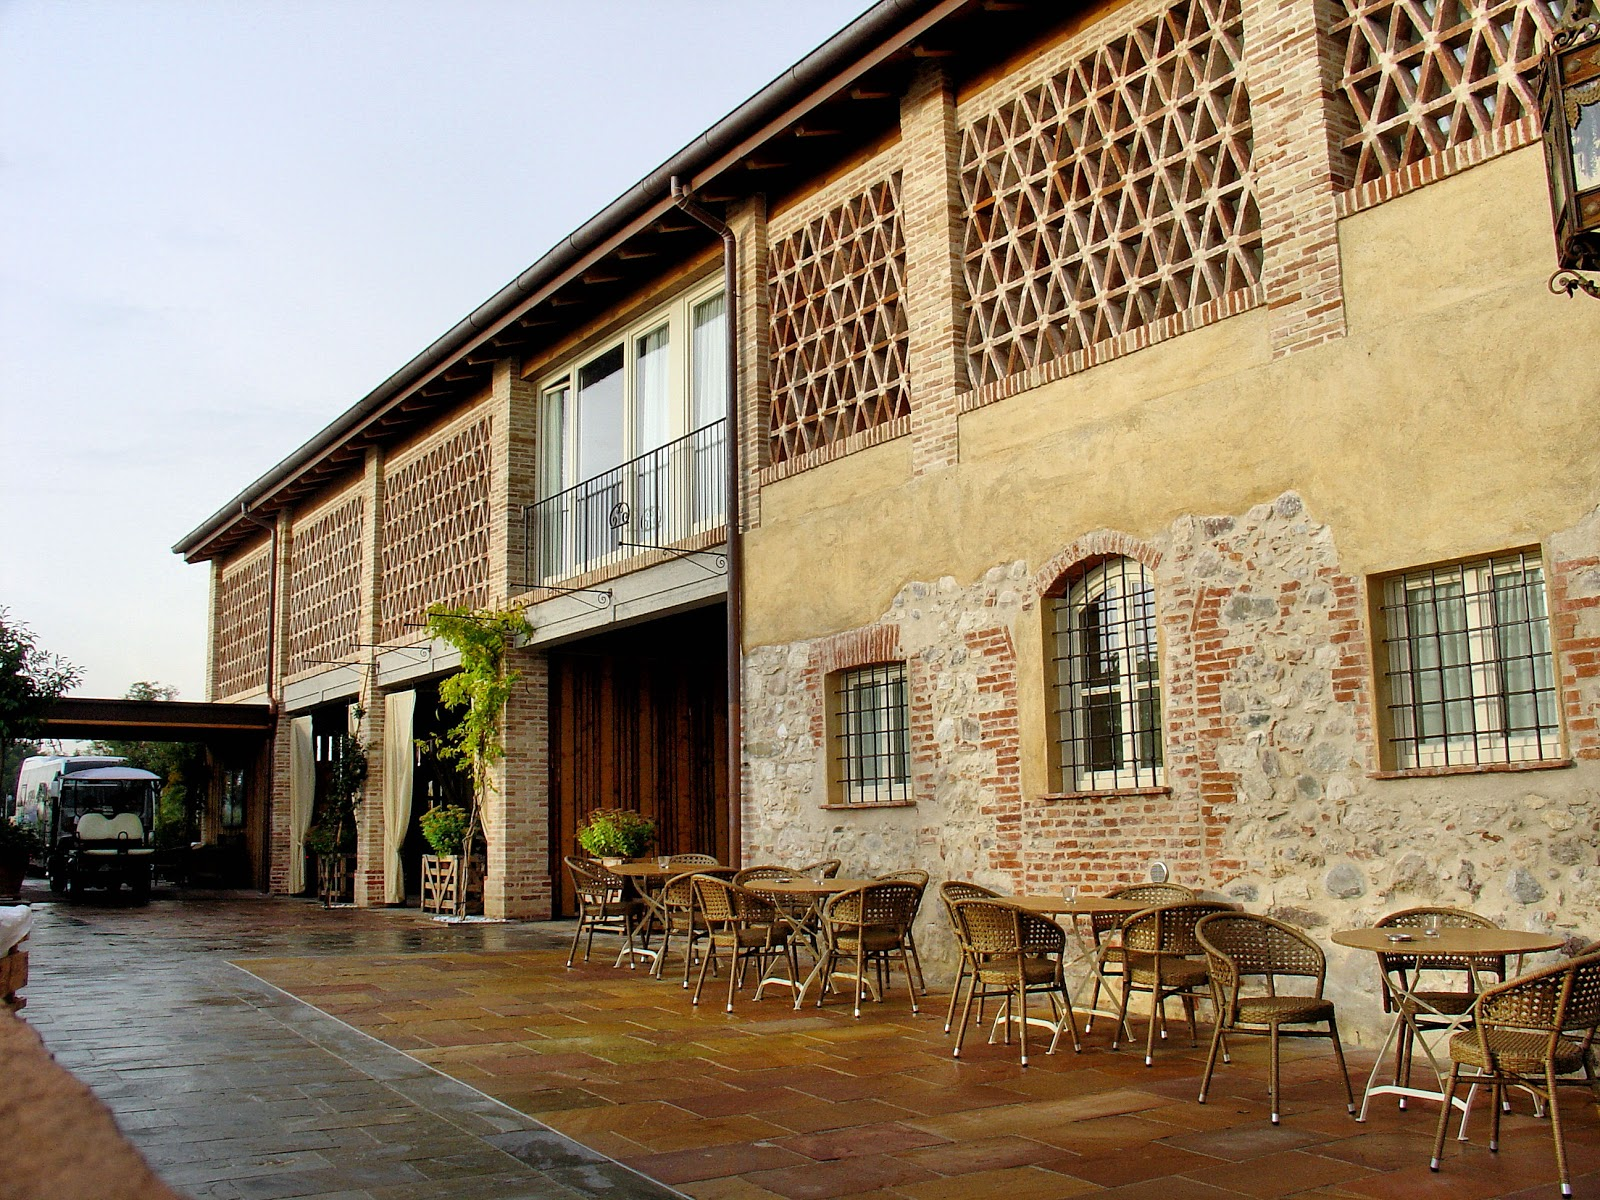 Rustic charm abounds at Le Ali del Frassino.